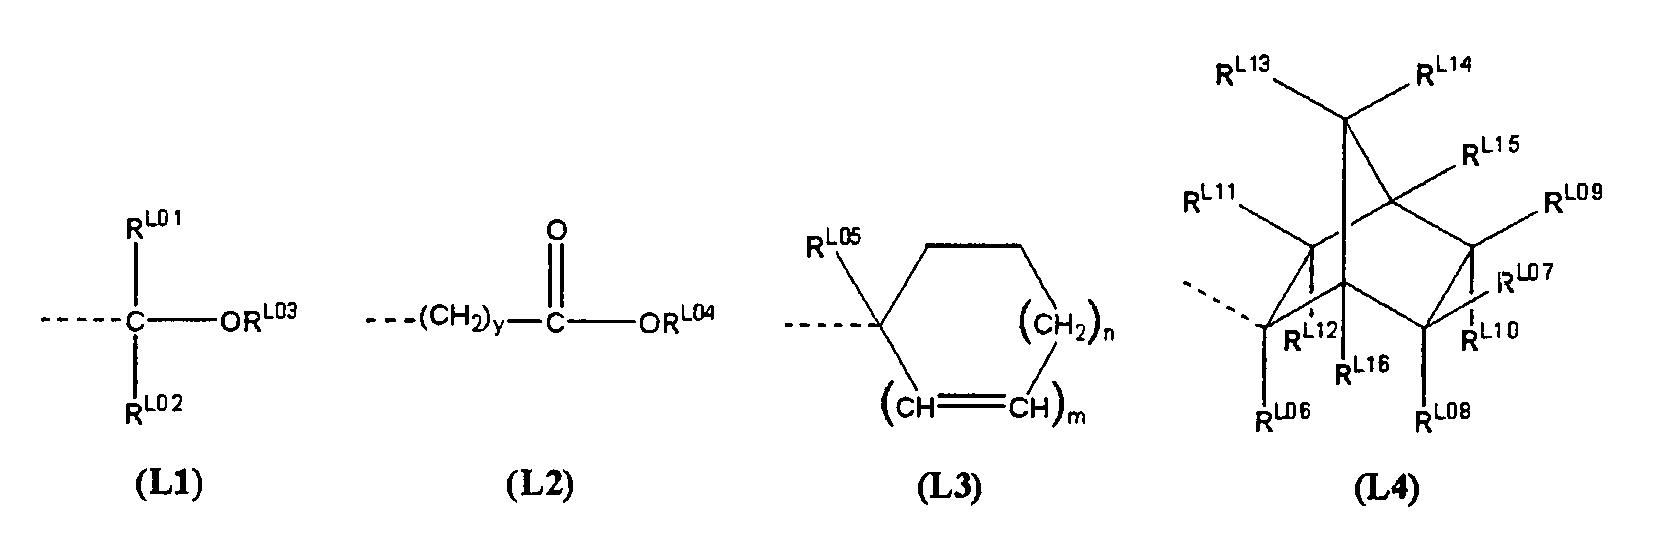 Figure 112002022201306-pat00013